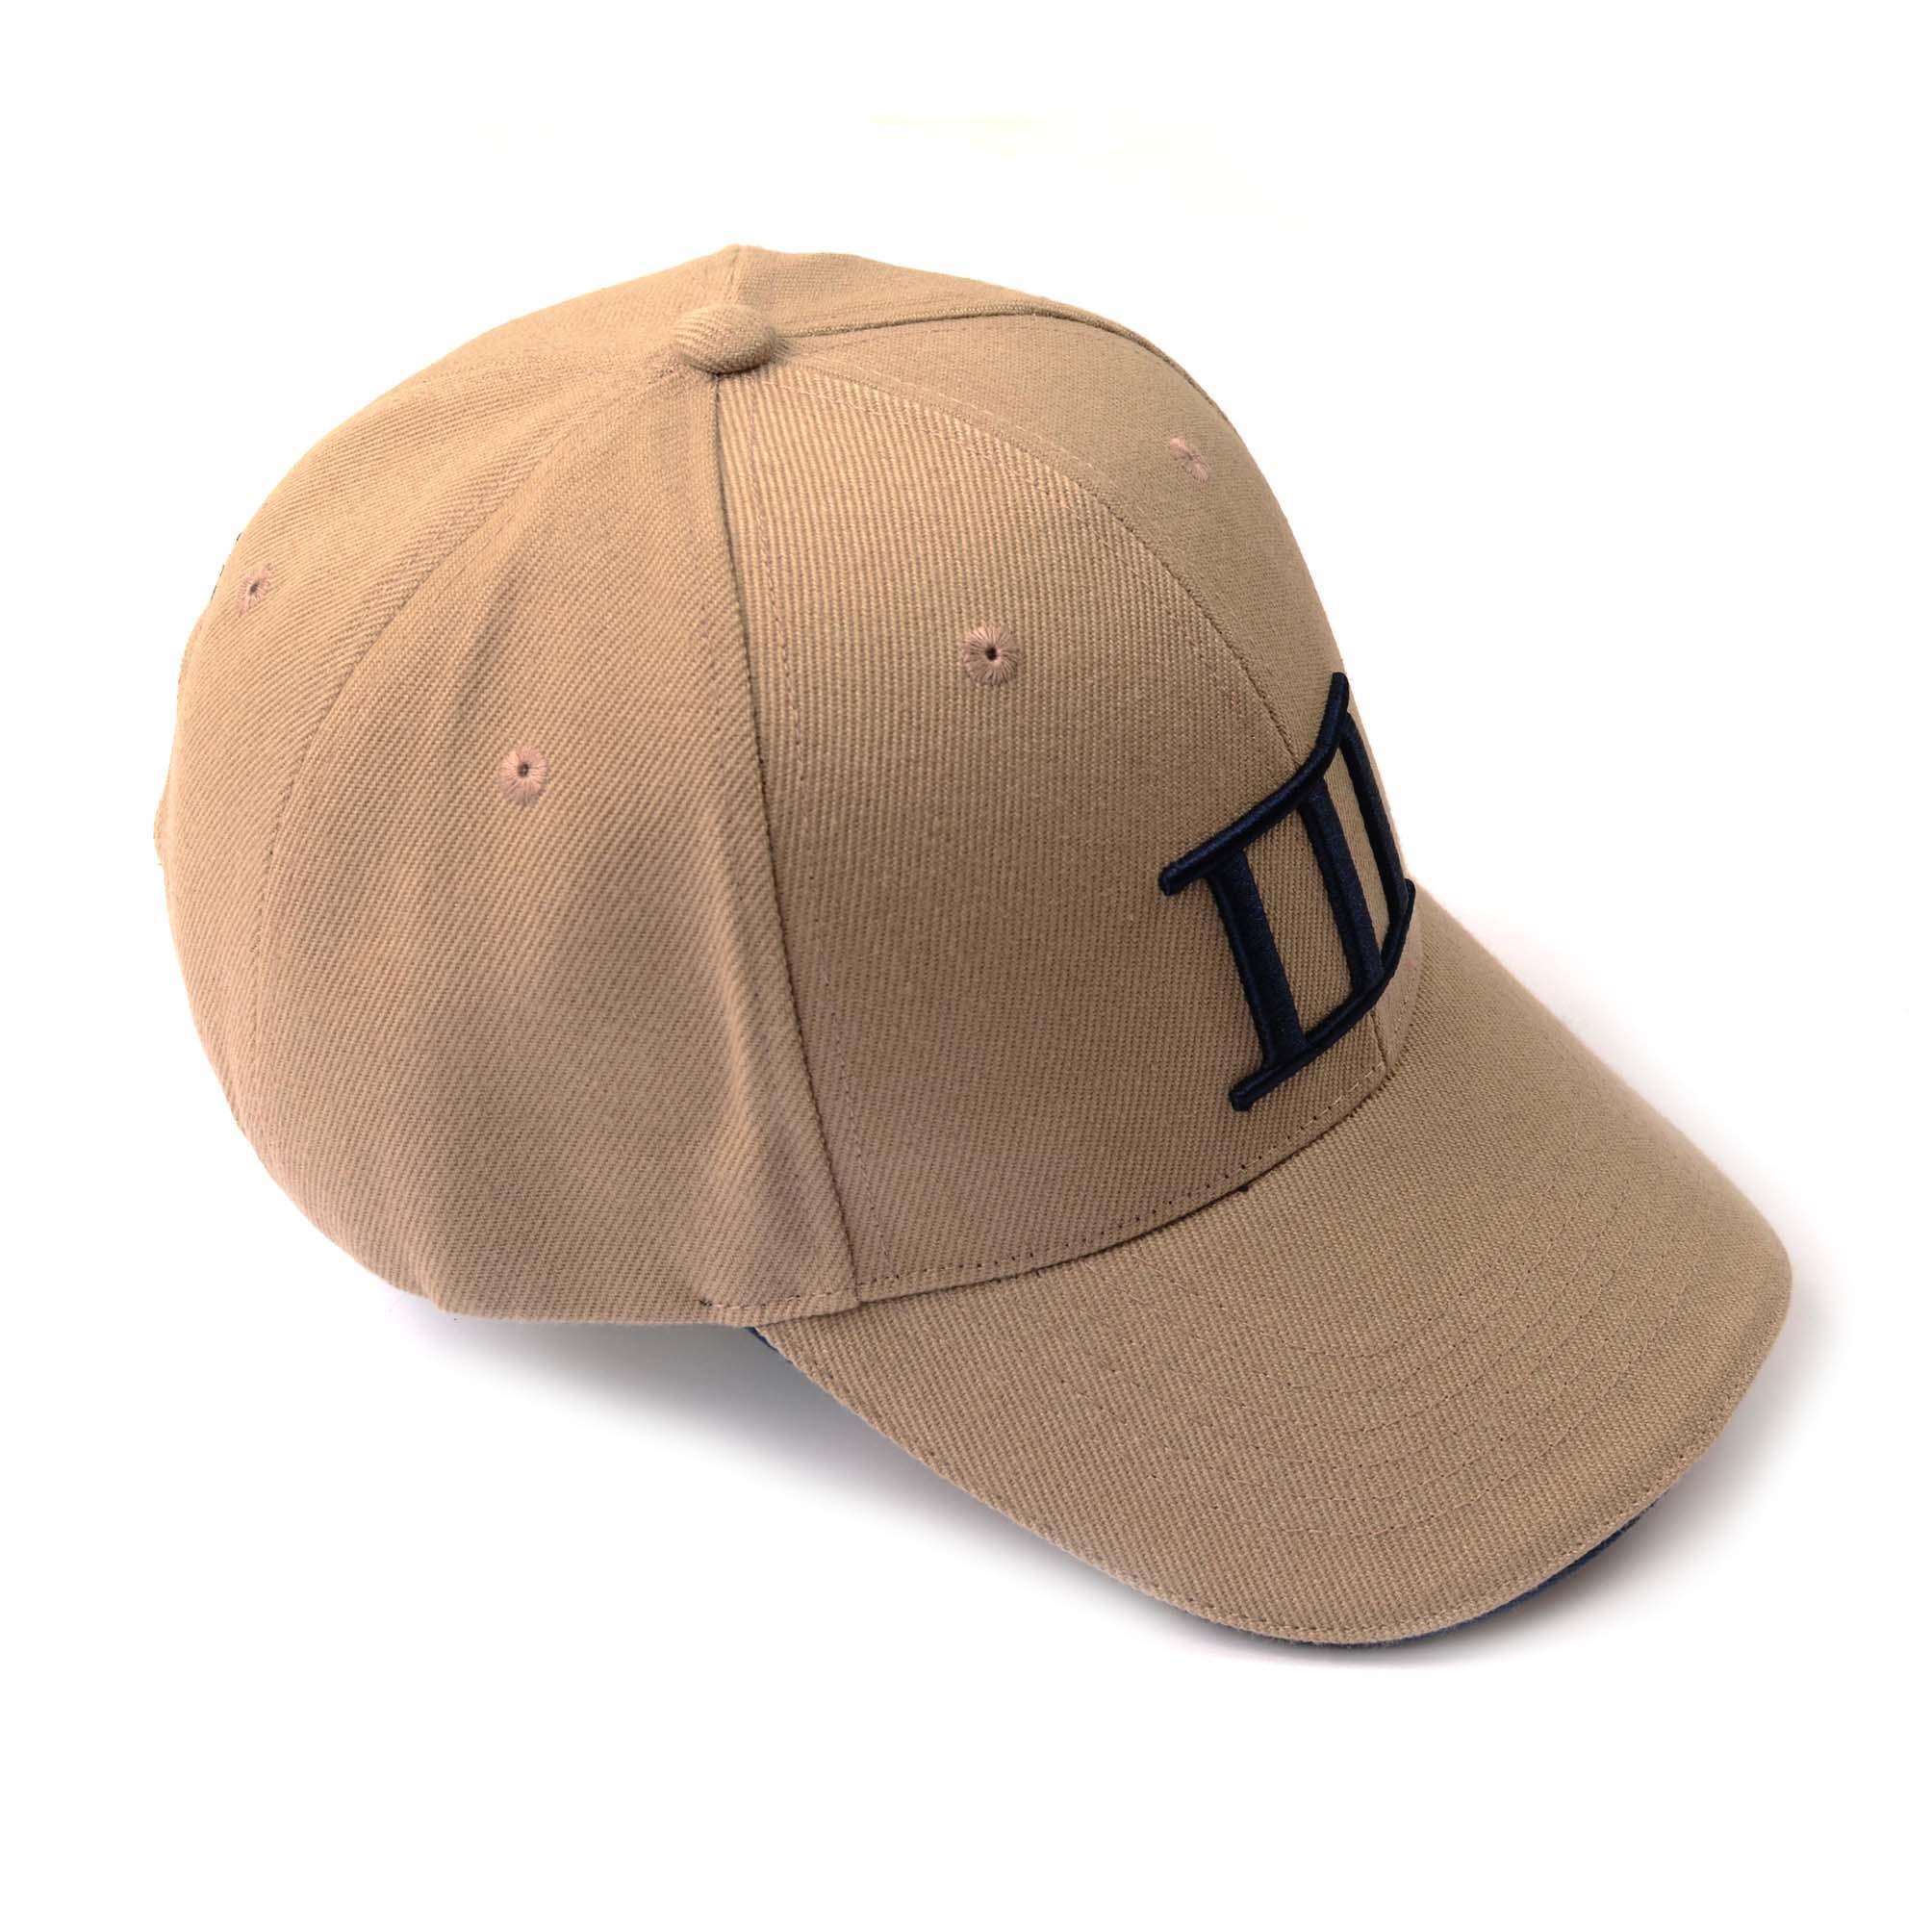 Beige Tresanti branded cap